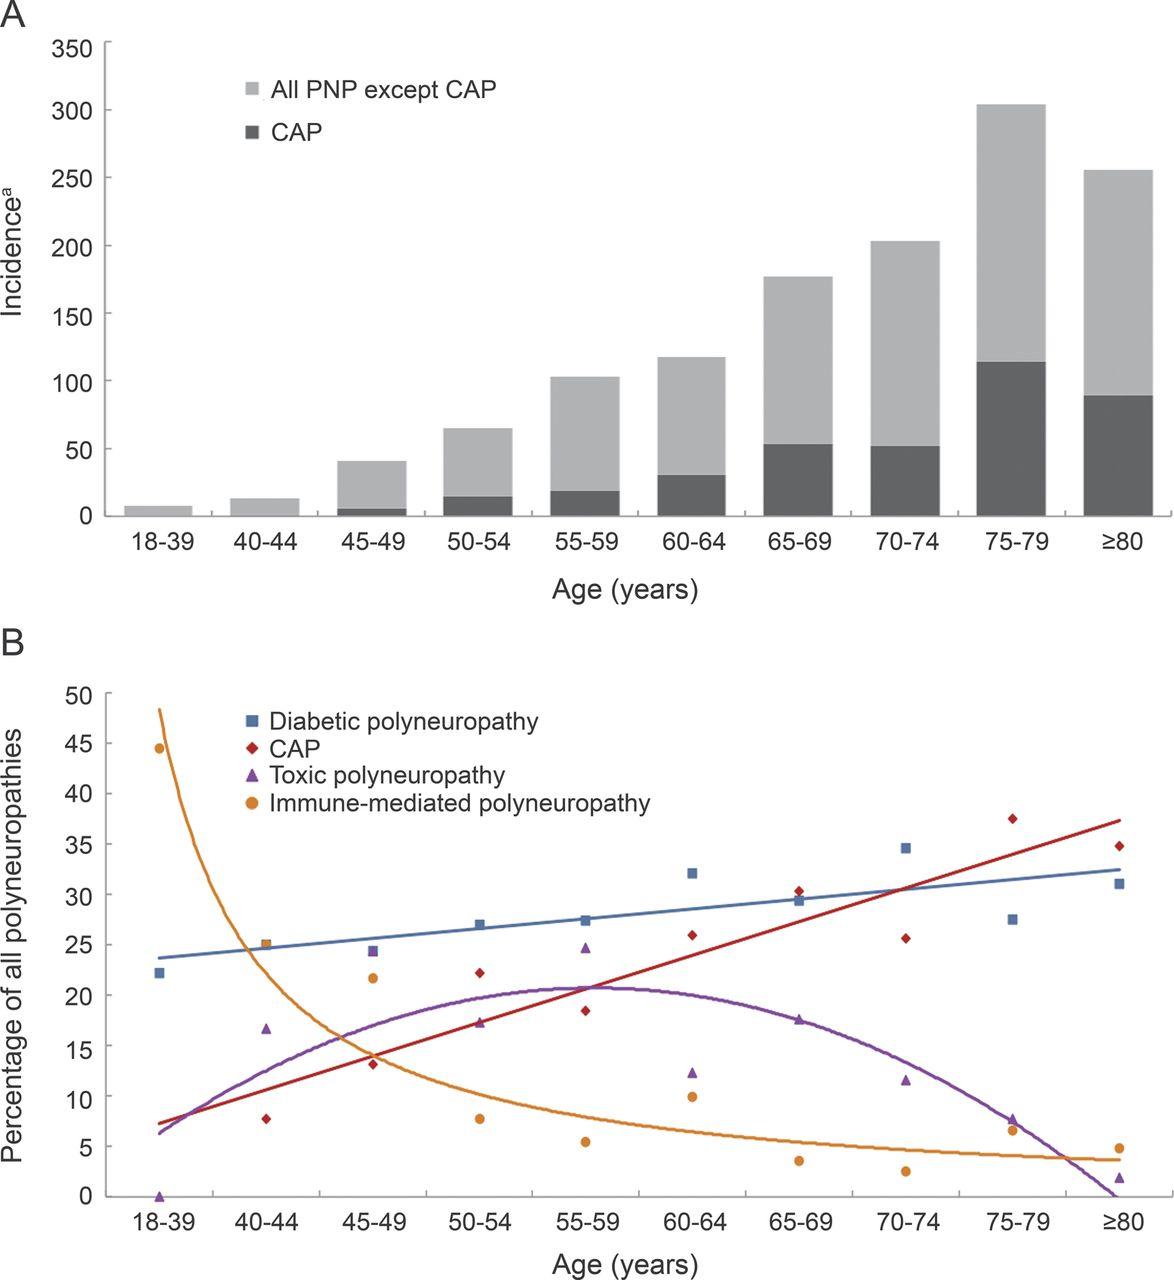 Incidence of polyneuropathy in utrecht the netherlands neurology download figure toneelgroepblik Gallery